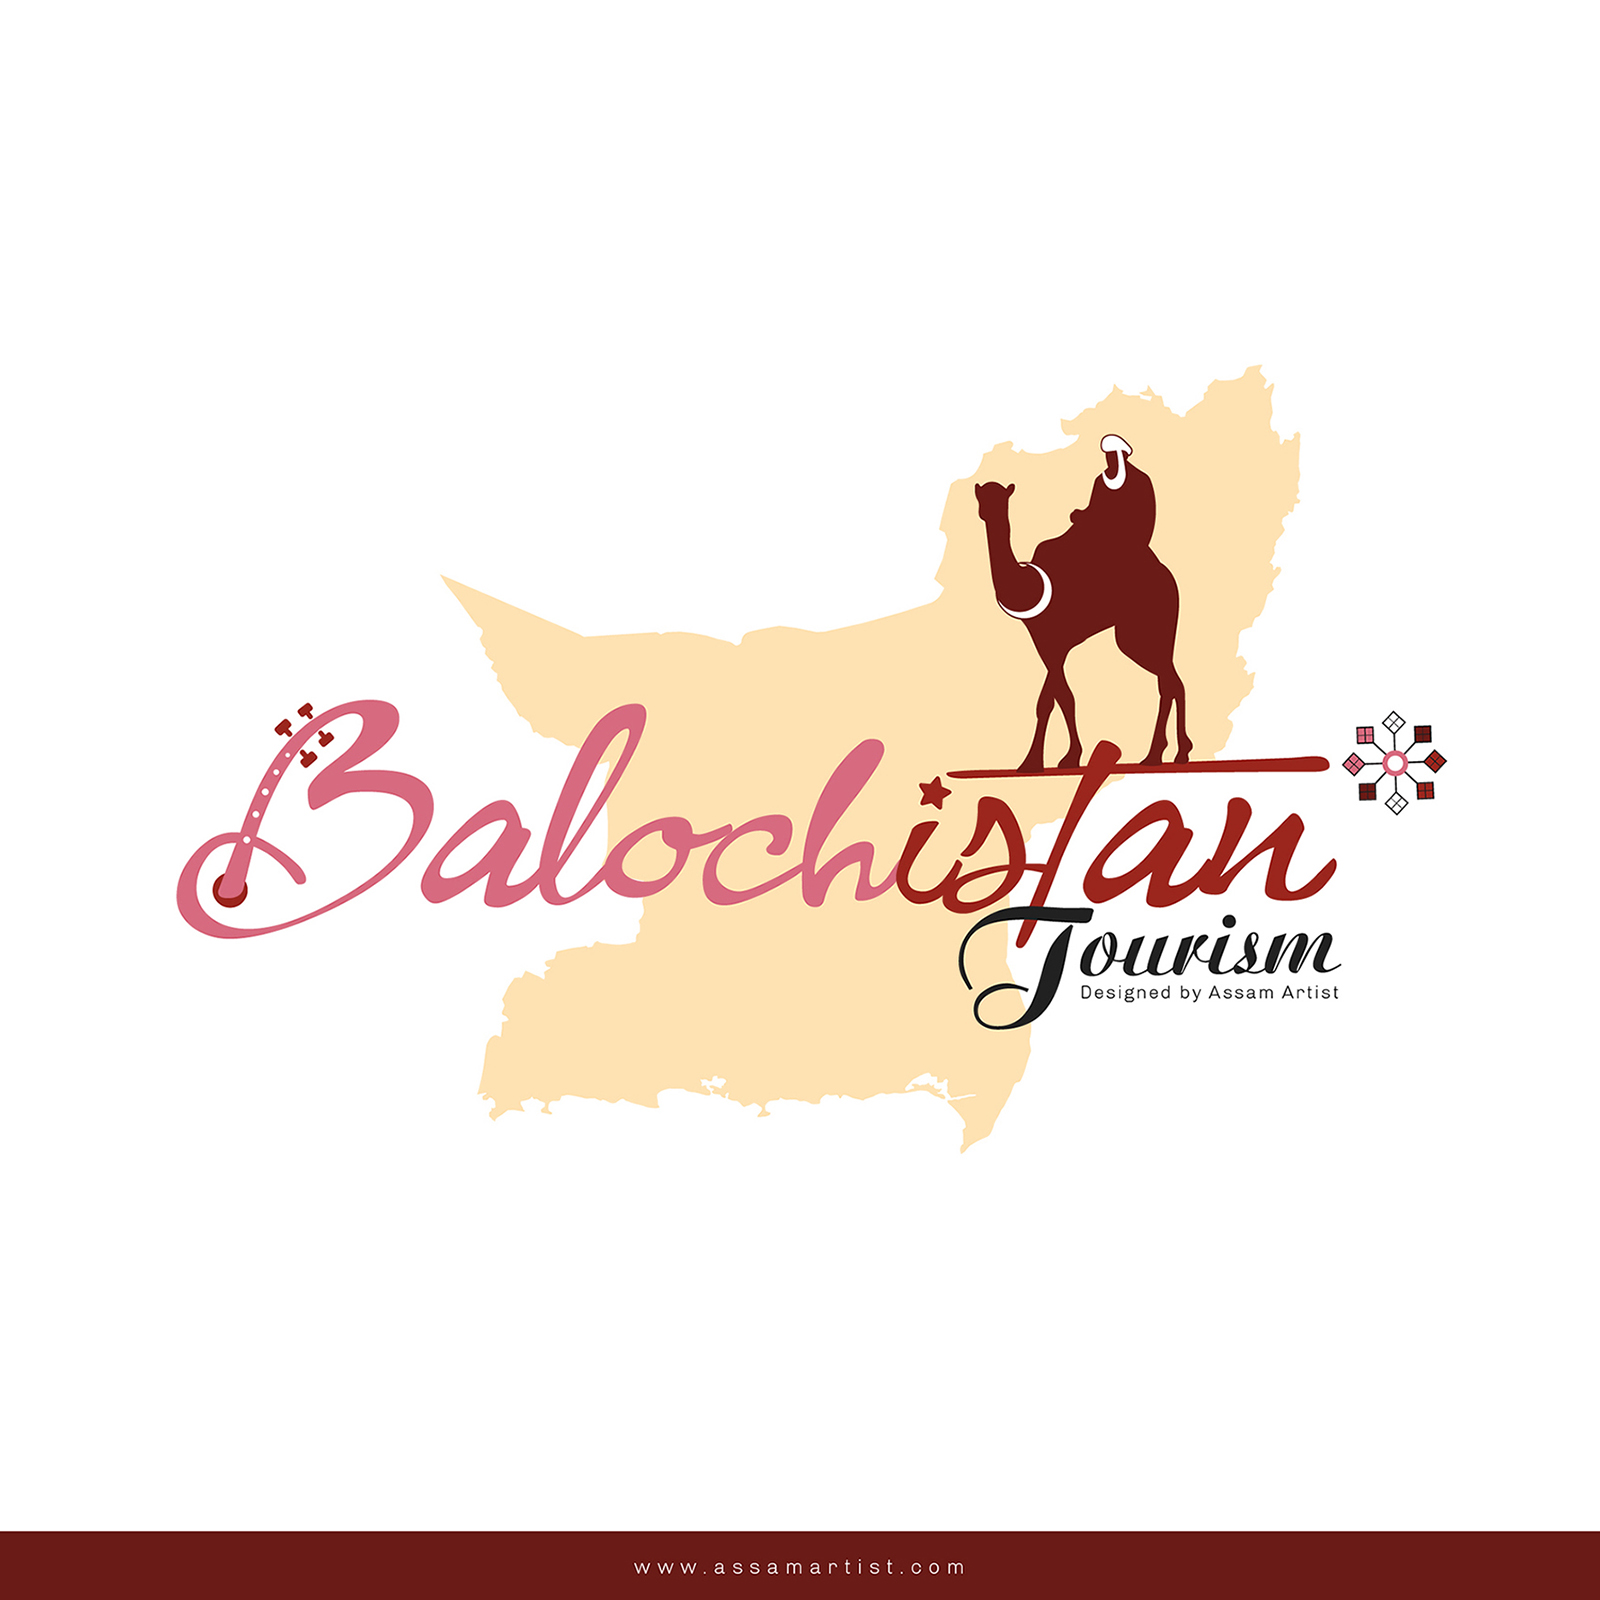 Balochistan tourism logo & Pakistan tourism logo